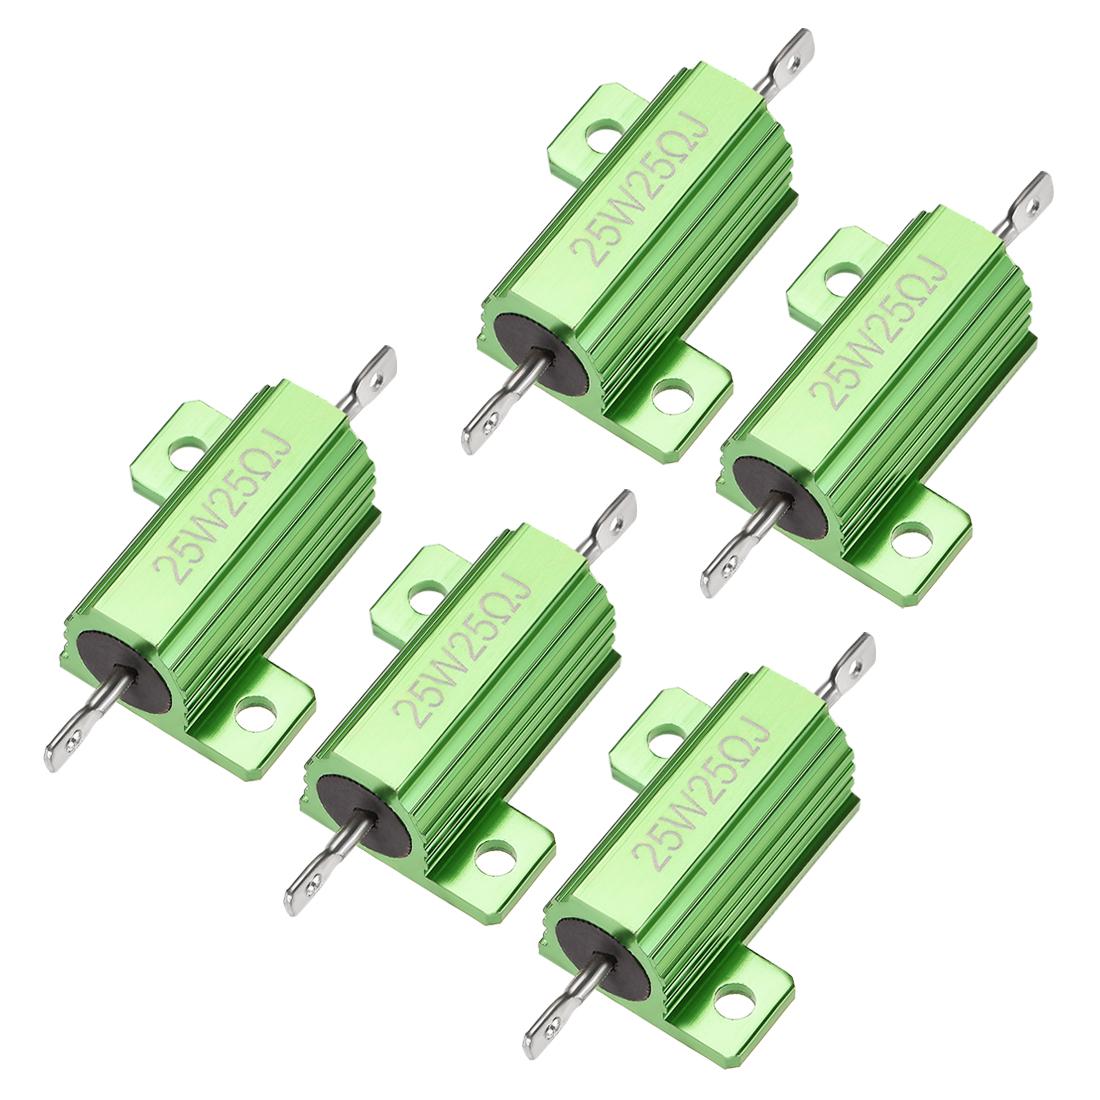 25W 25 Ohm 5% Aluminum Housing Resistor Wirewound Resistor Green Tone 5 Pcs